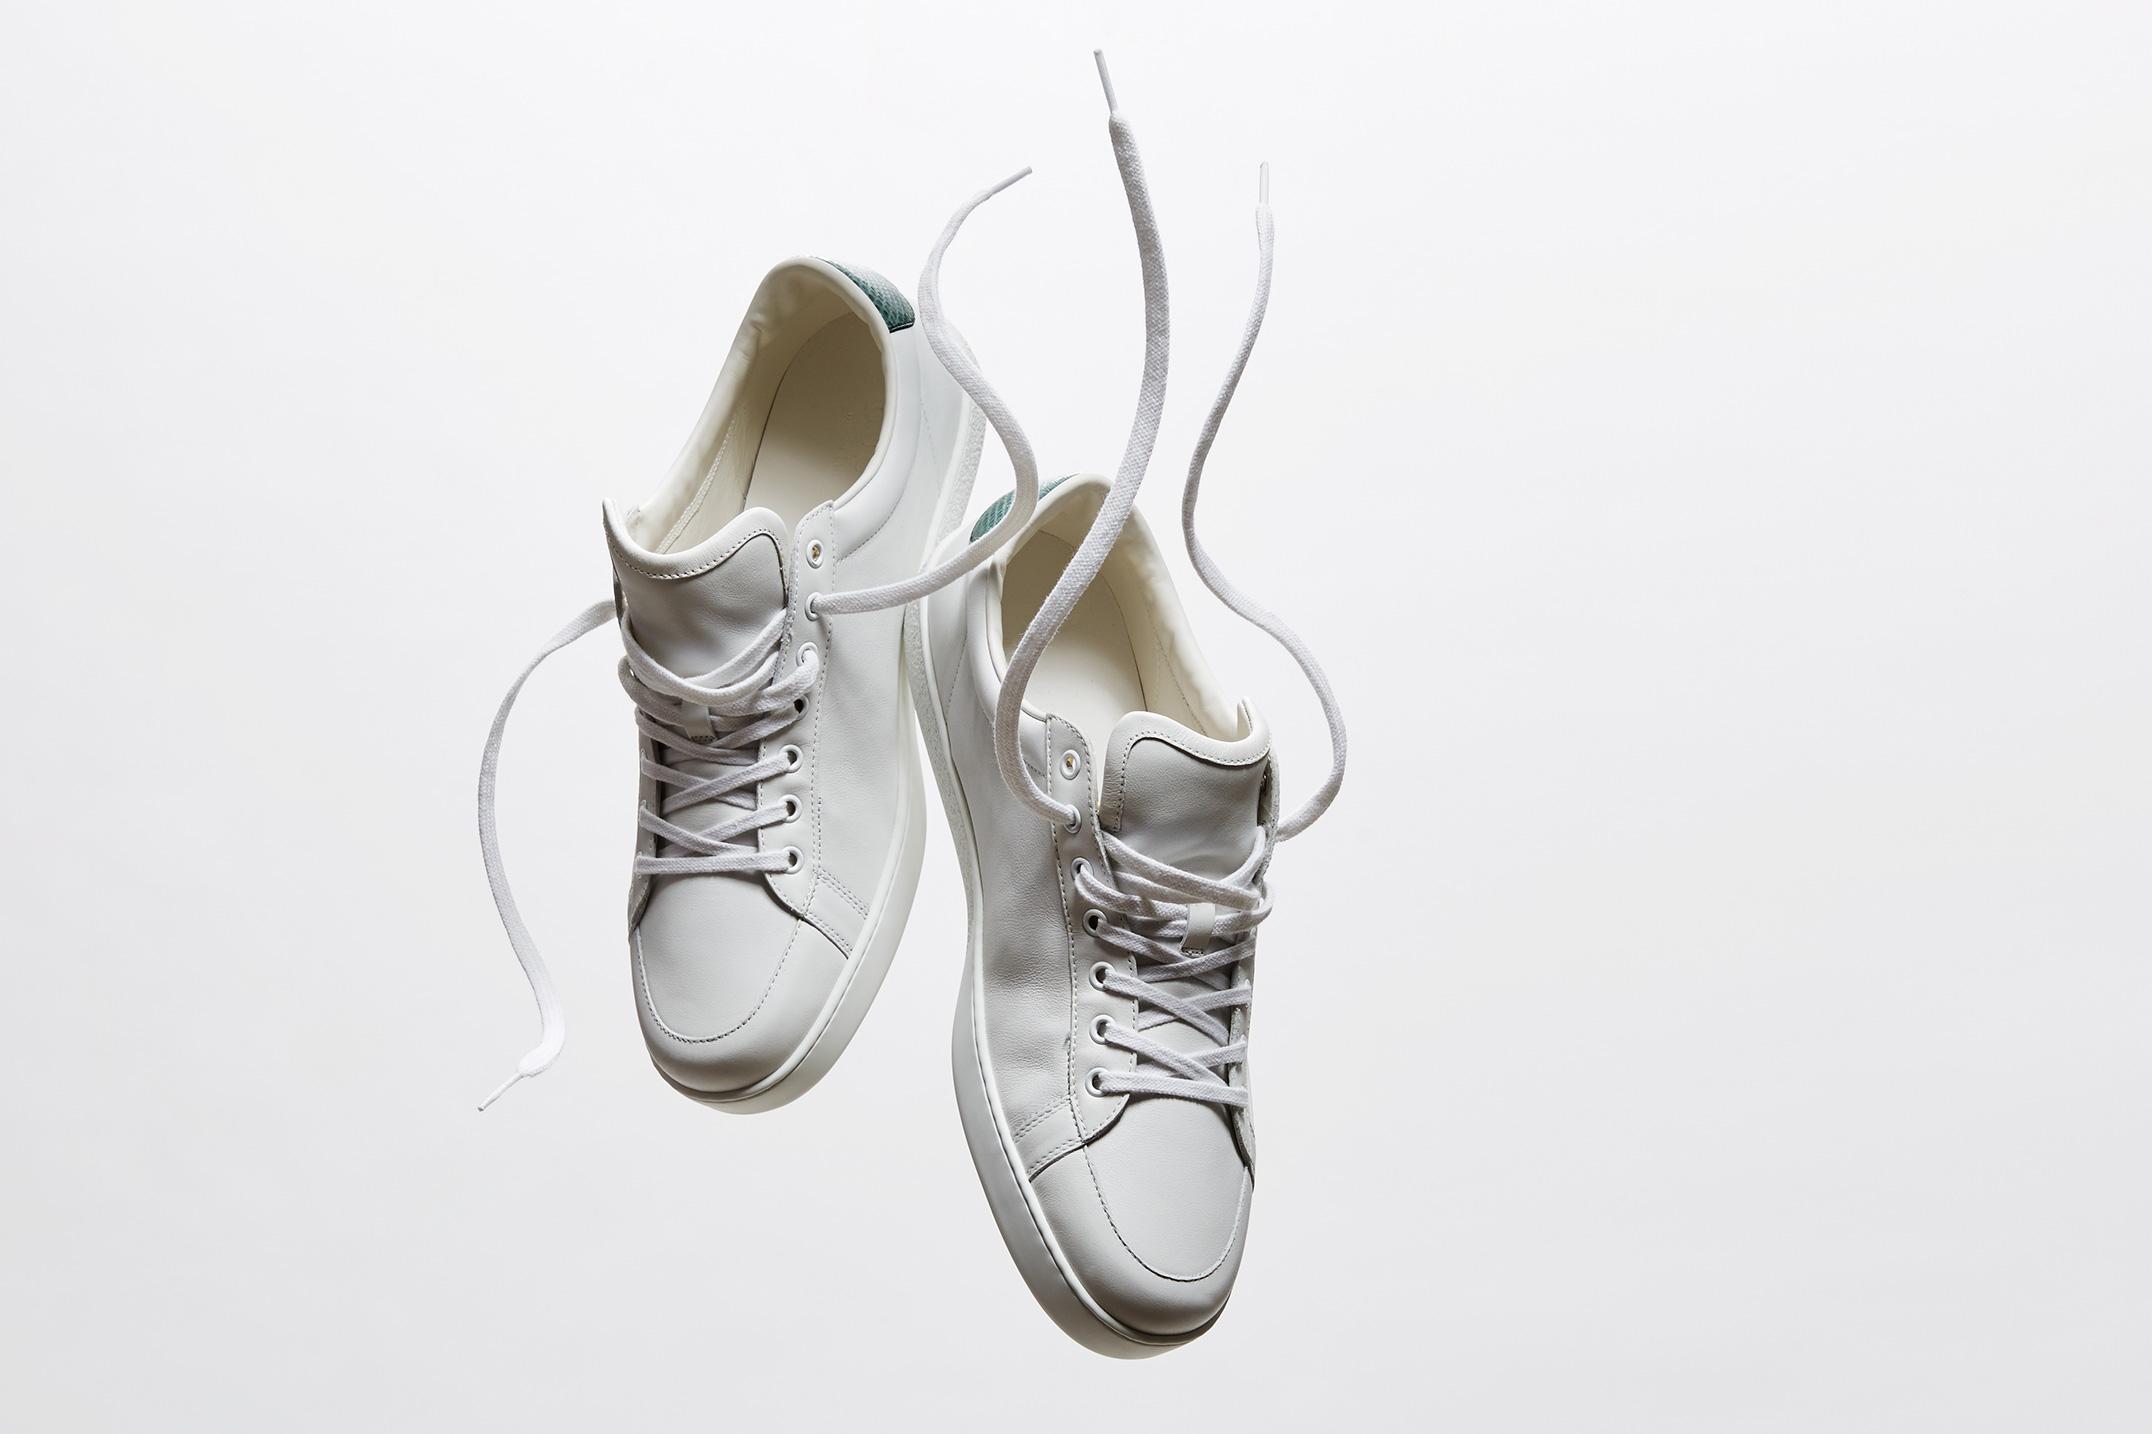 Pitti_Uomo_MRTW_1110153715_Sneakers_EDITORIAL_PLP_848.jpg